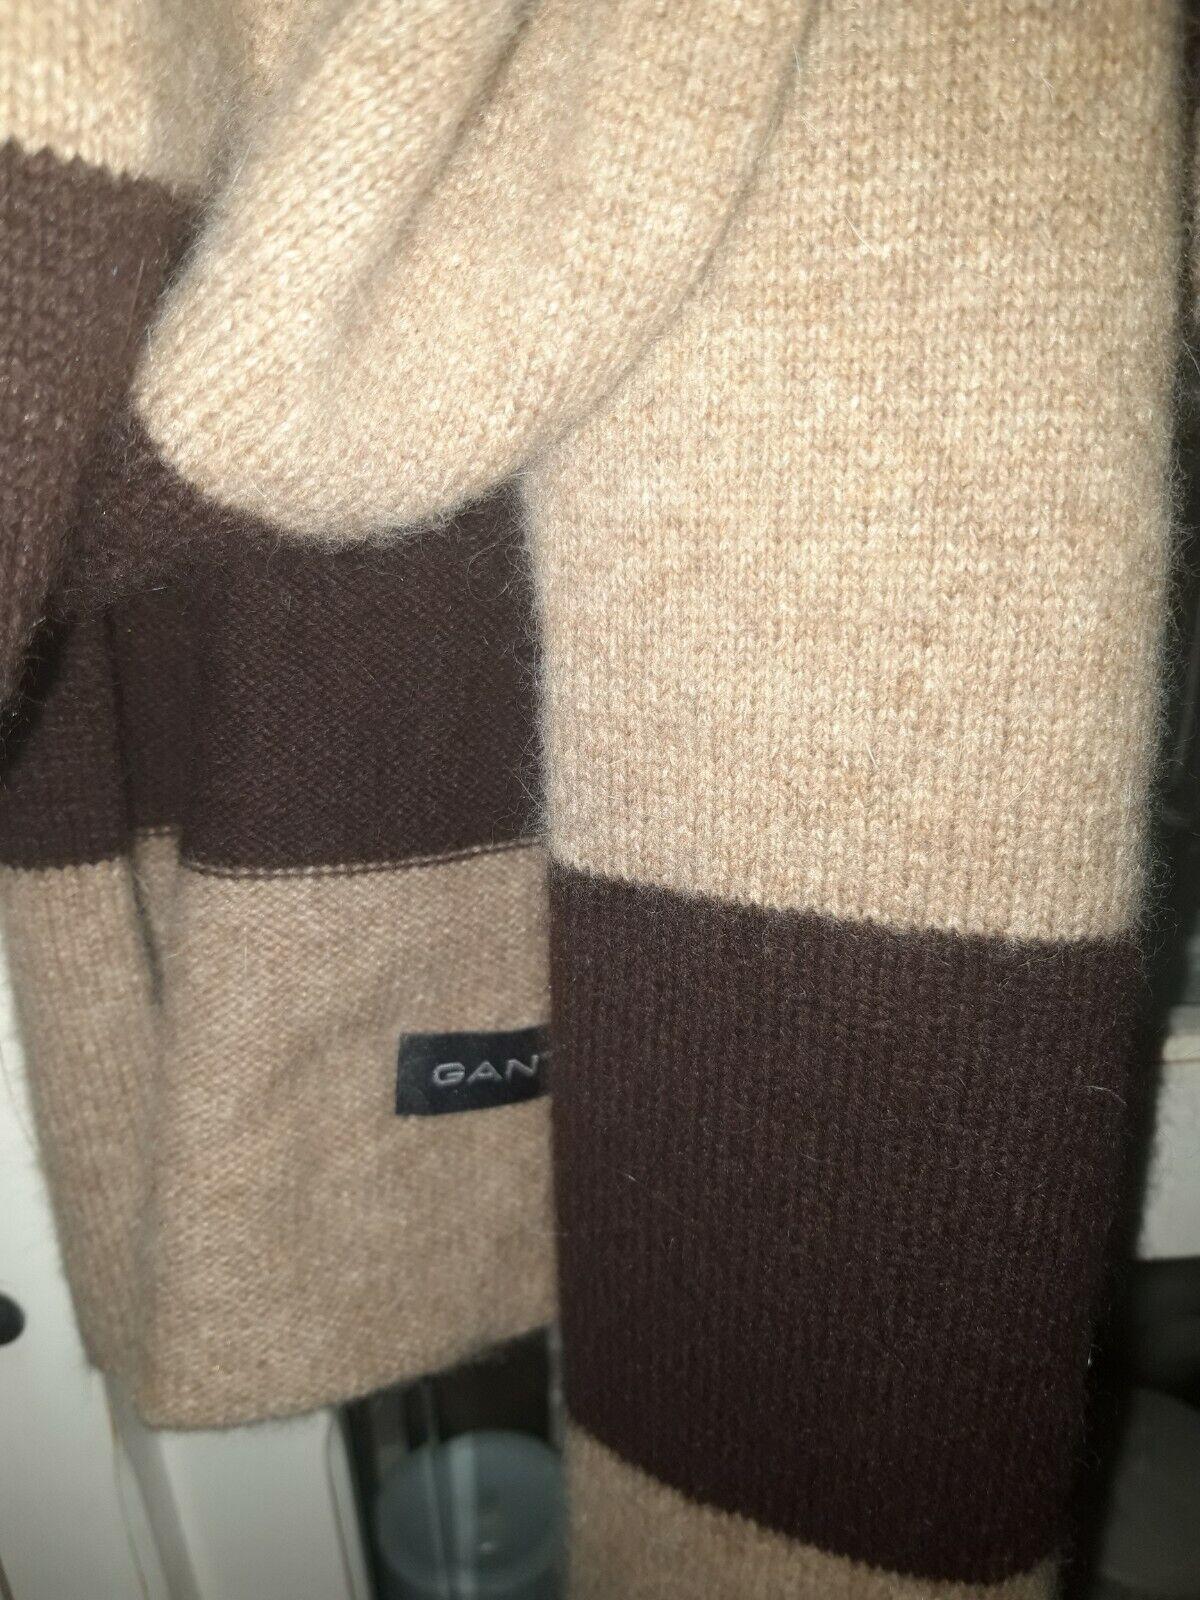 ♡GANT♡ Schal aktuelle Kollektion Neuwertig Wolle Kaschmir braun beige gestreift